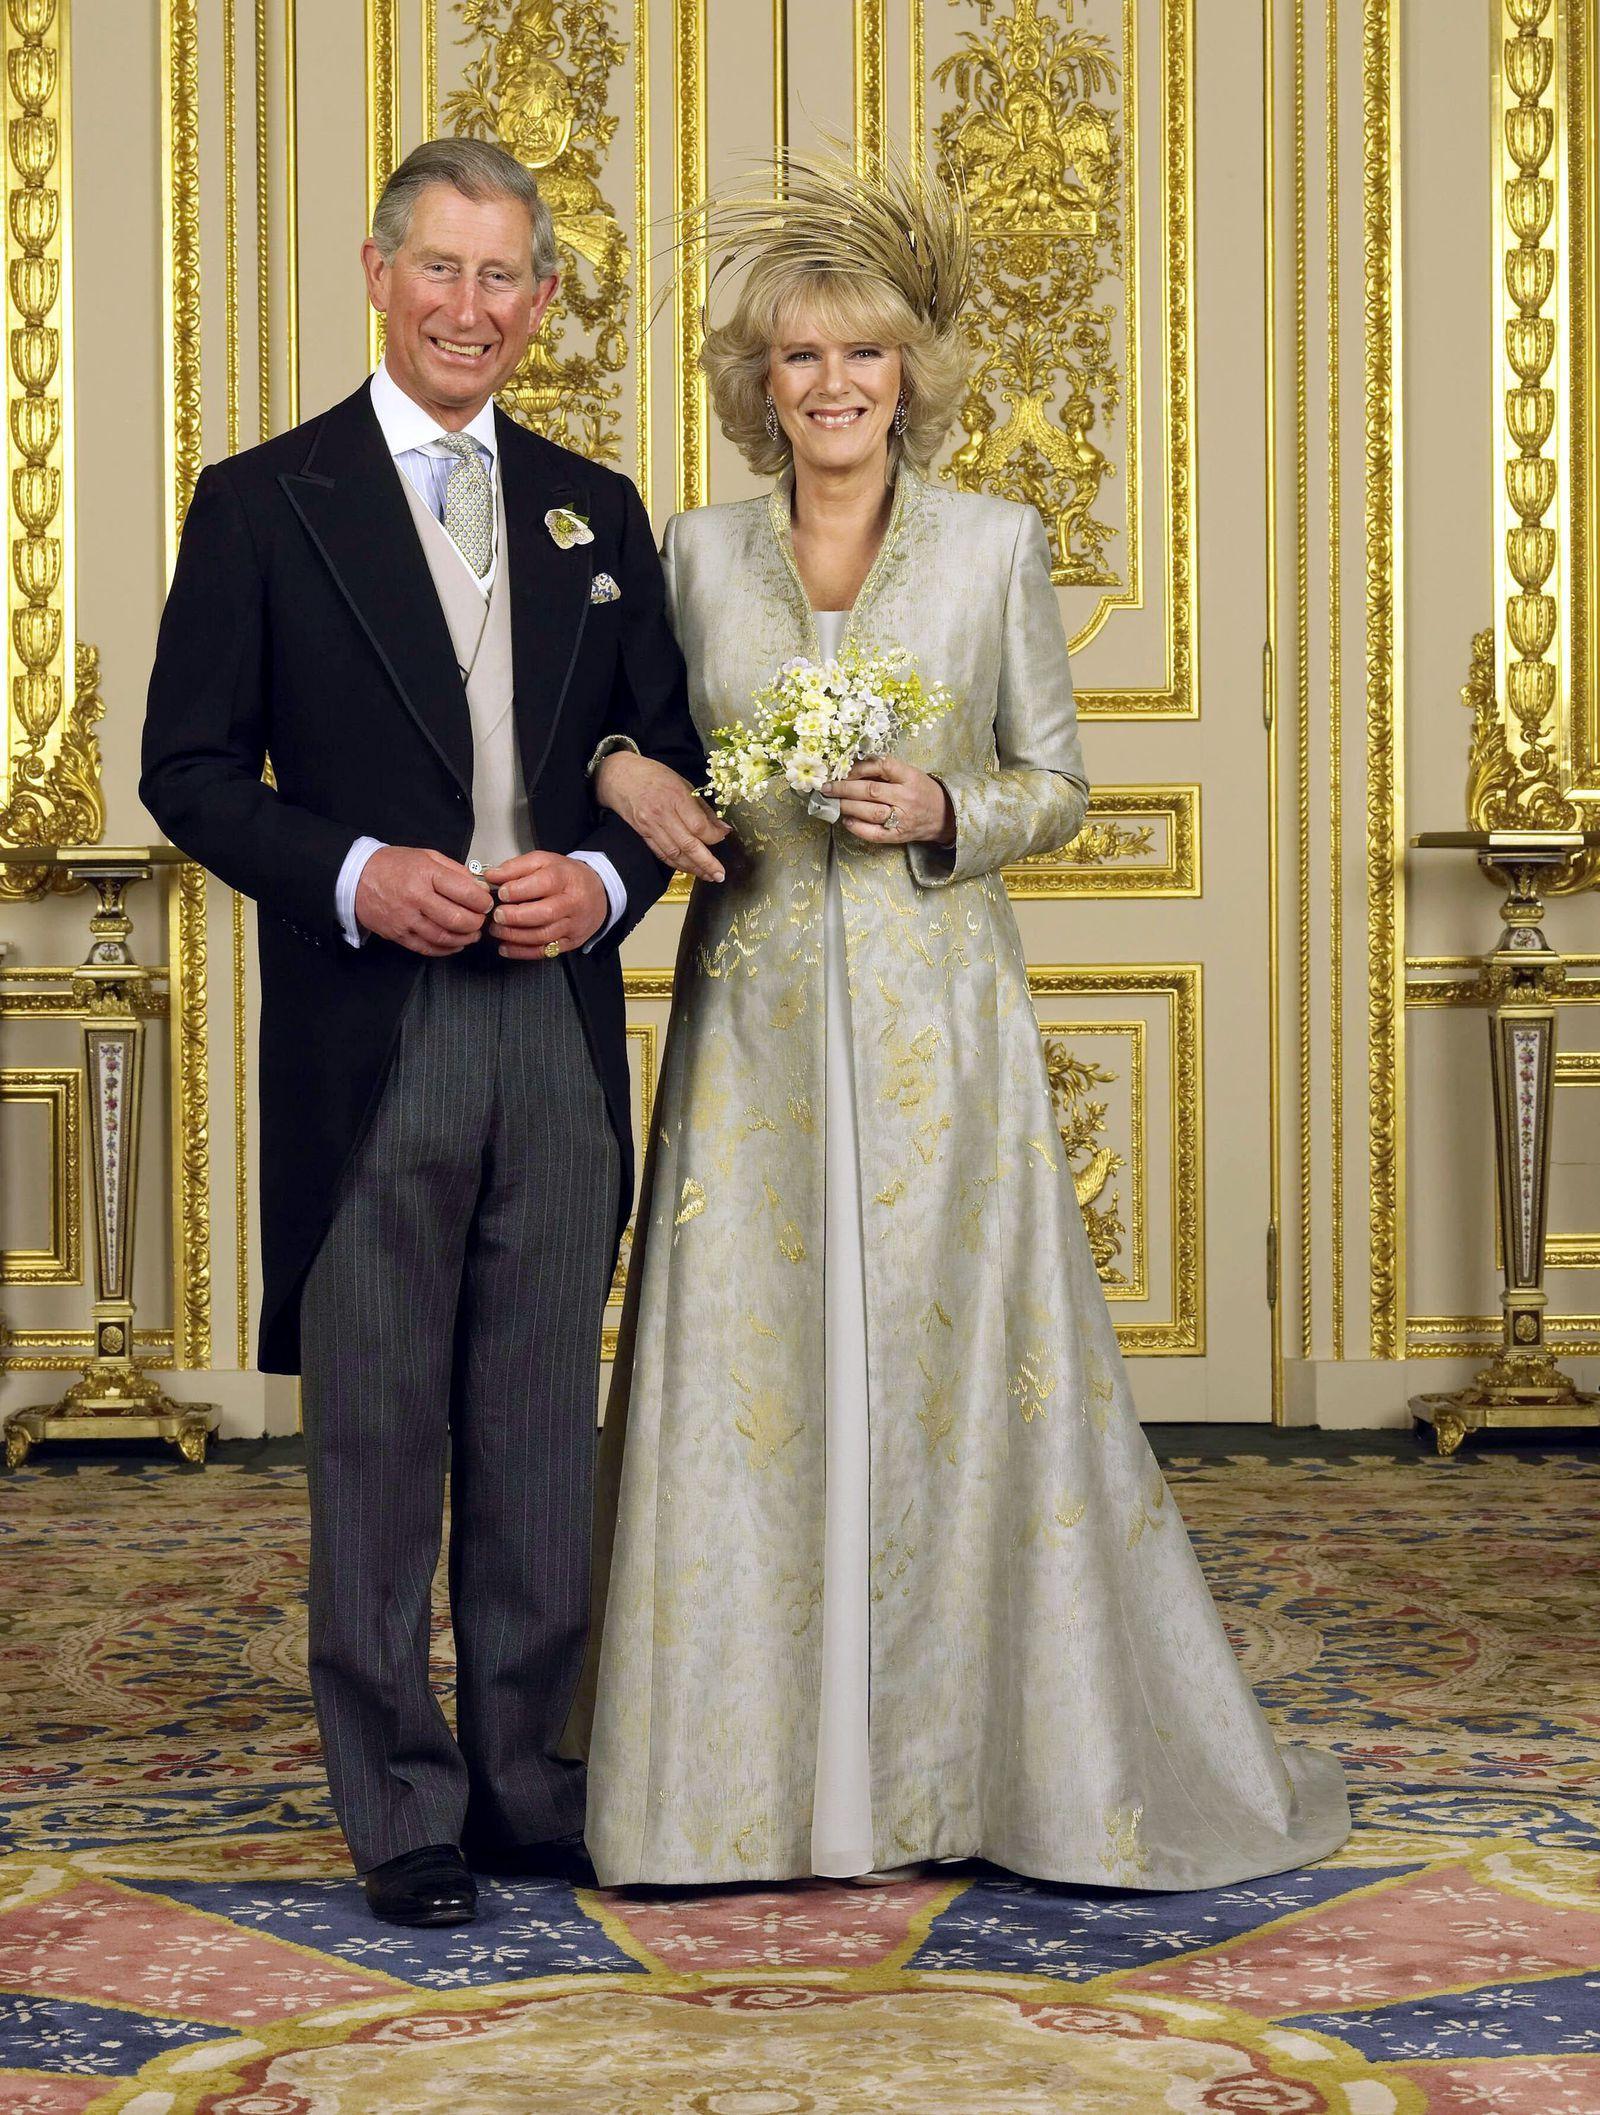 13 of the Juiciest Royal Wedding Scandals Royal wedding